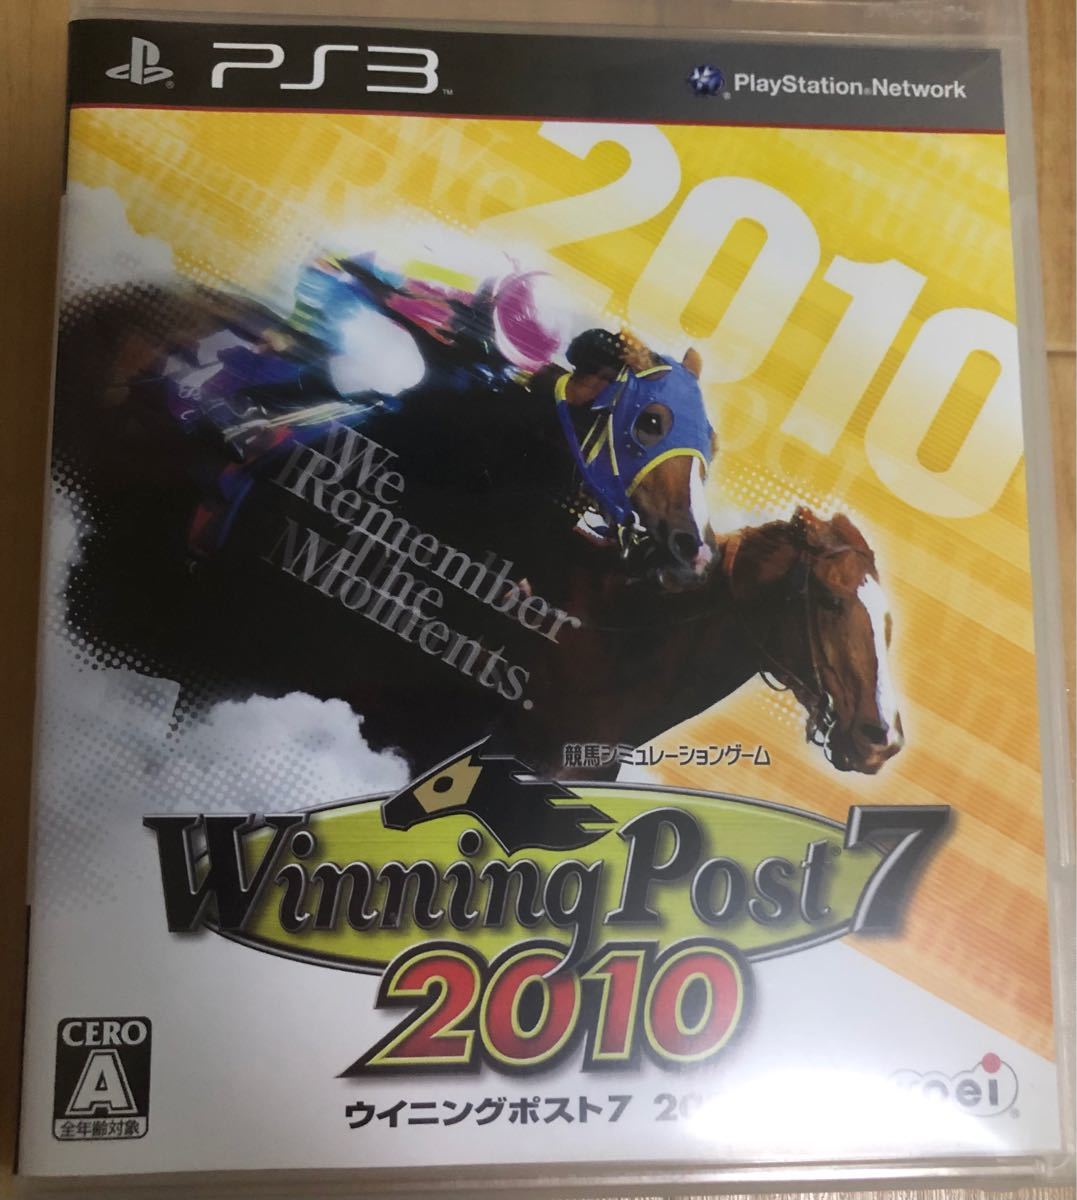 【PS3】 Winning Post 7 2010